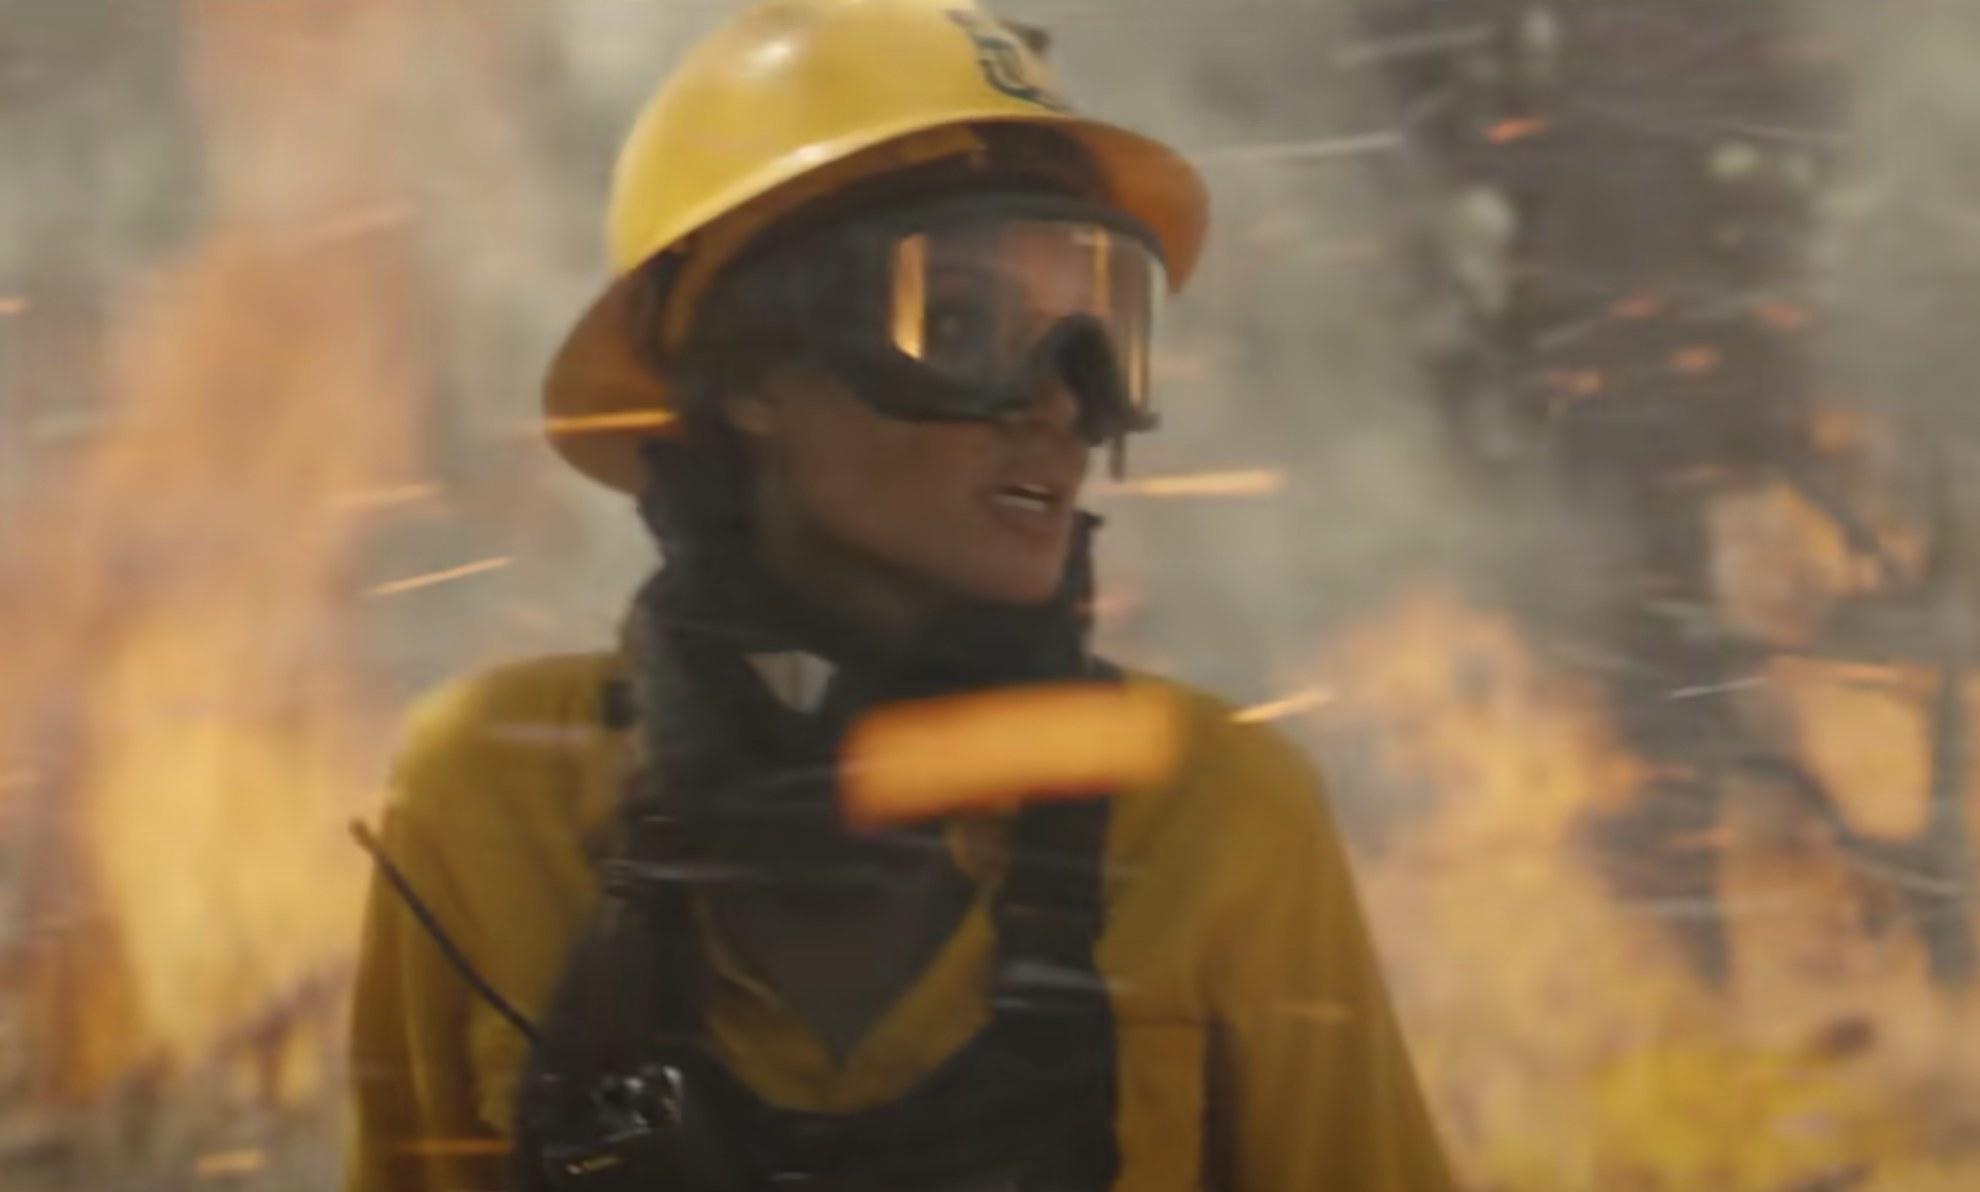 Angelina wears firefighter gear in the forest